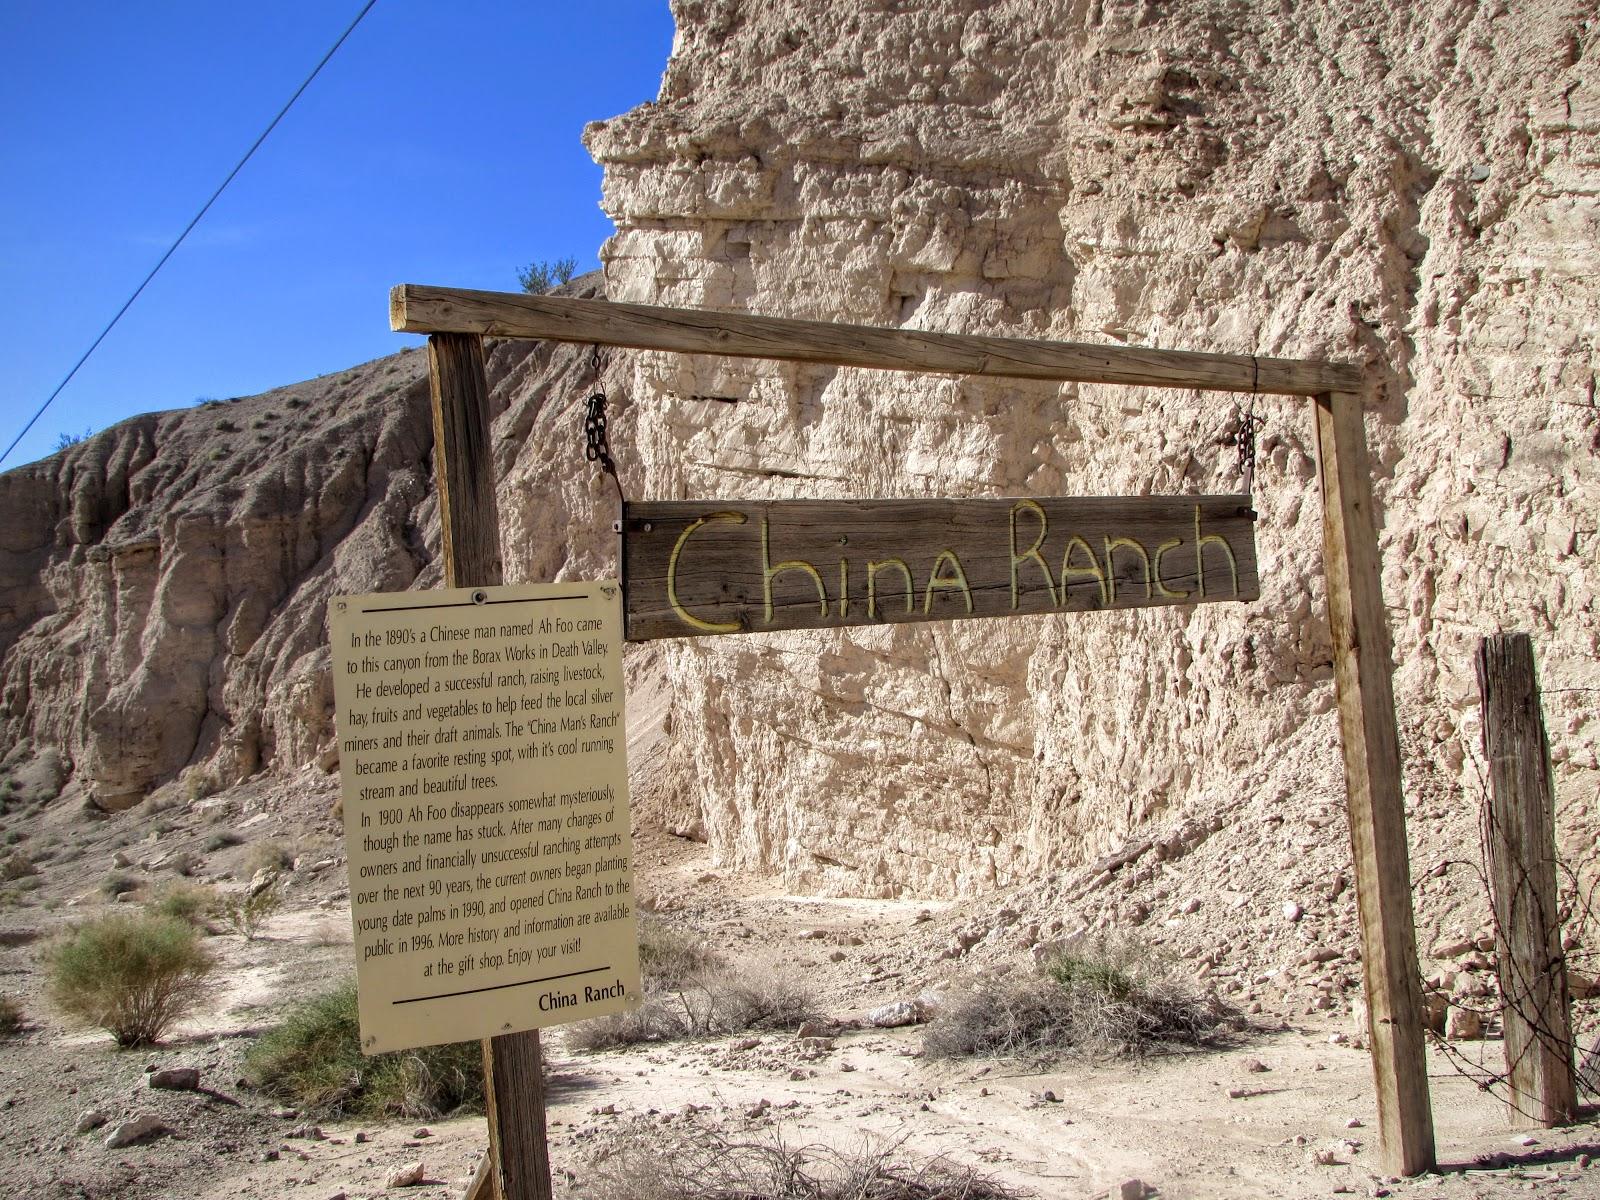 a la entrada de china ranch